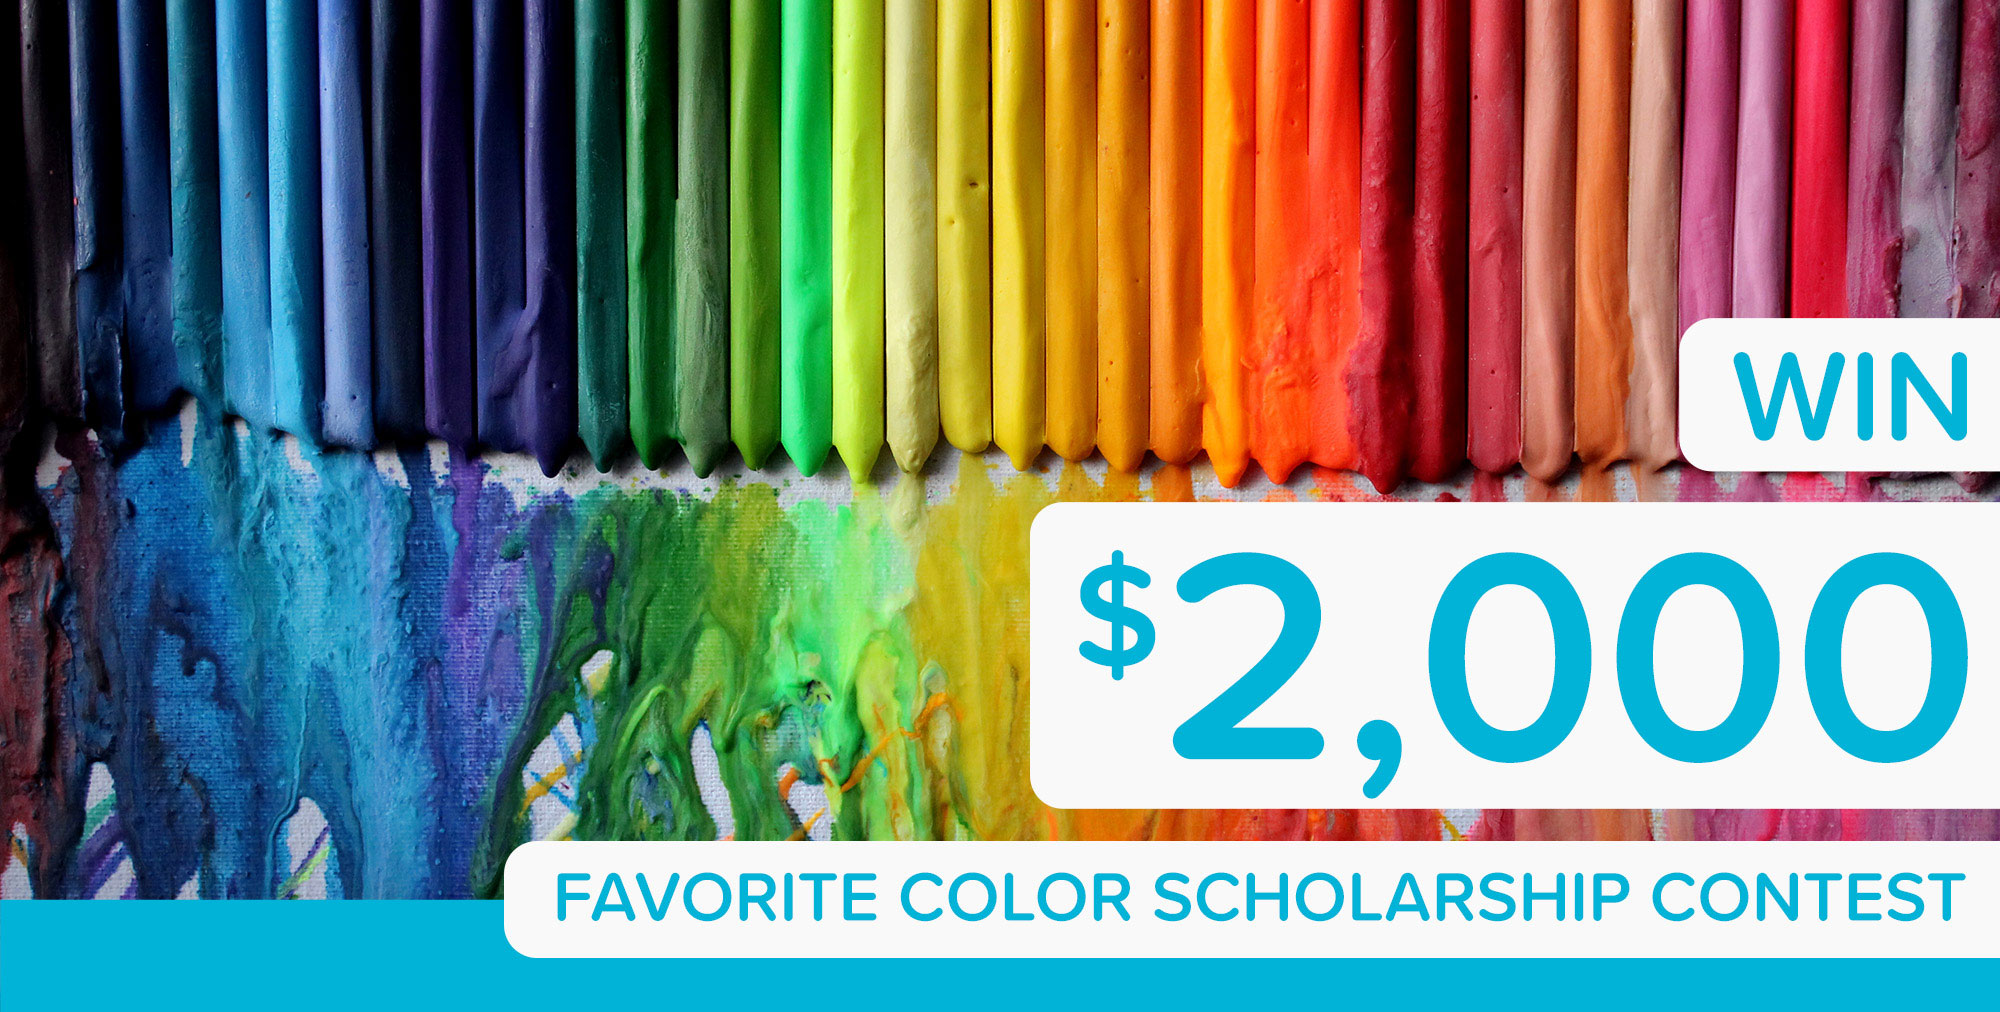 Favorite Color Scholarship Contest